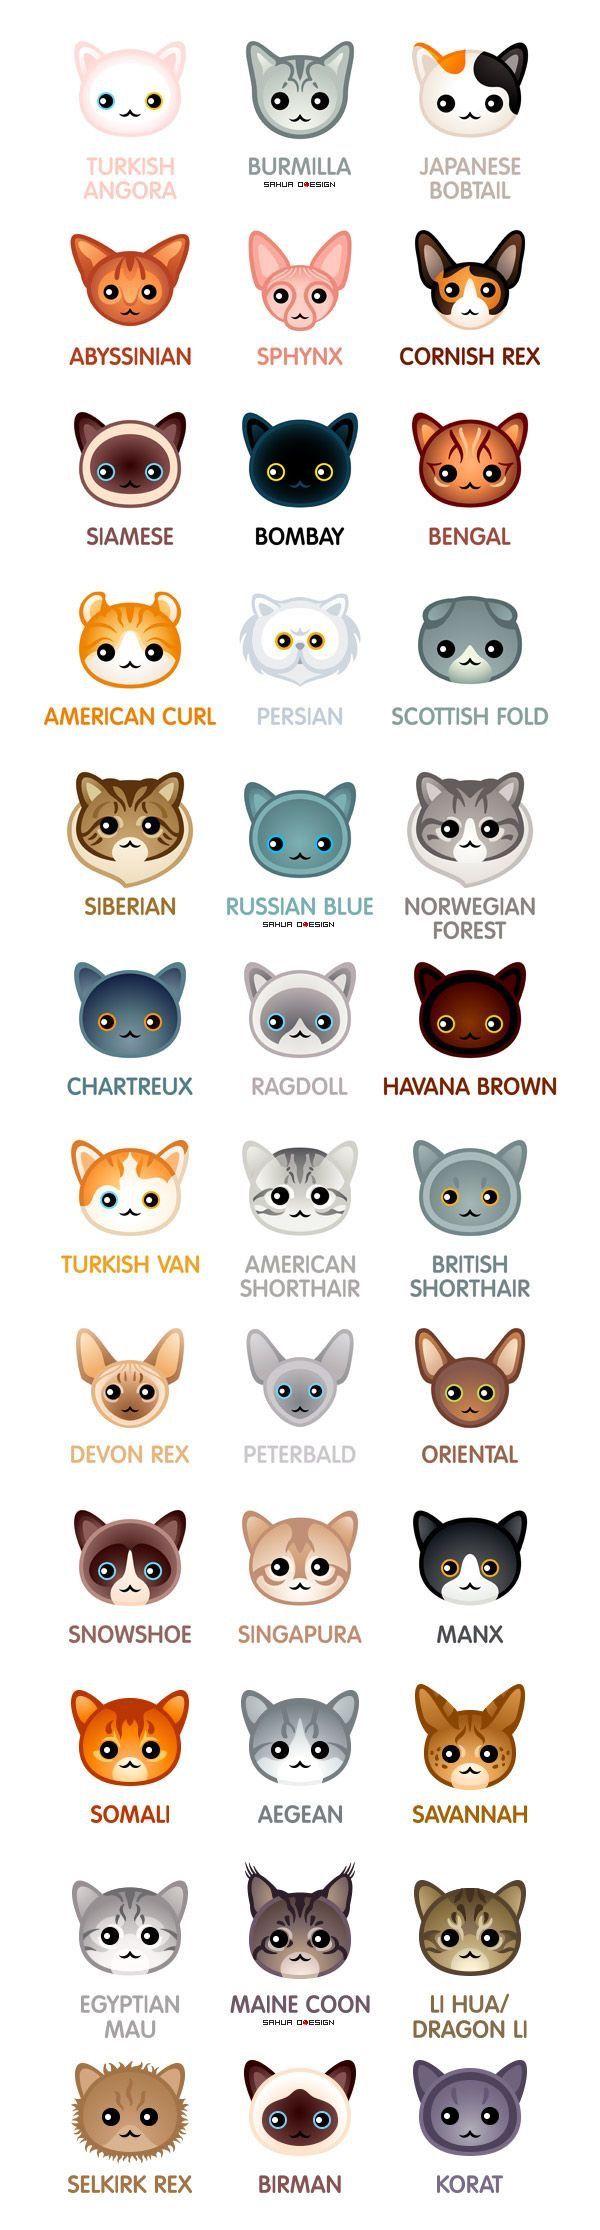 Best 25 manx ideas on pinterest manx cat bobtail cat and american bobtail